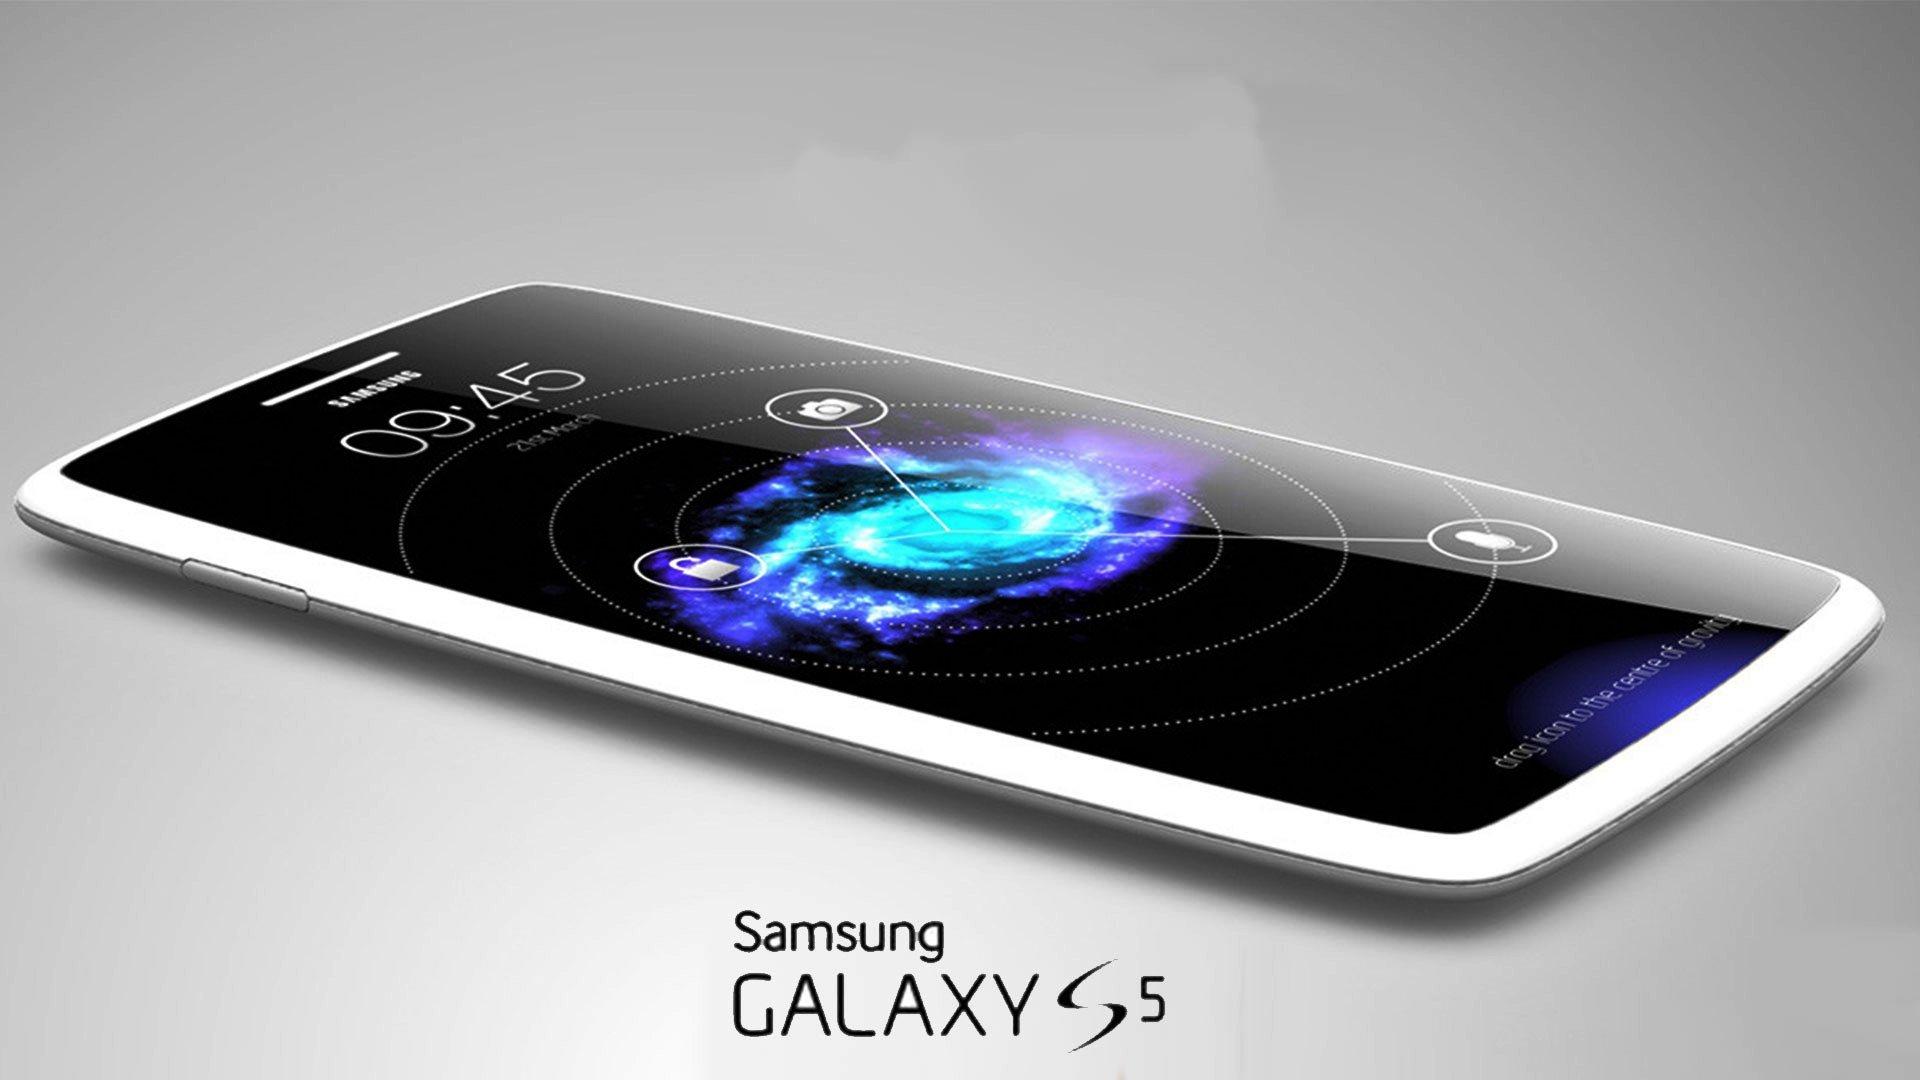 картинки самсунг галакси с6 эйдж плюс